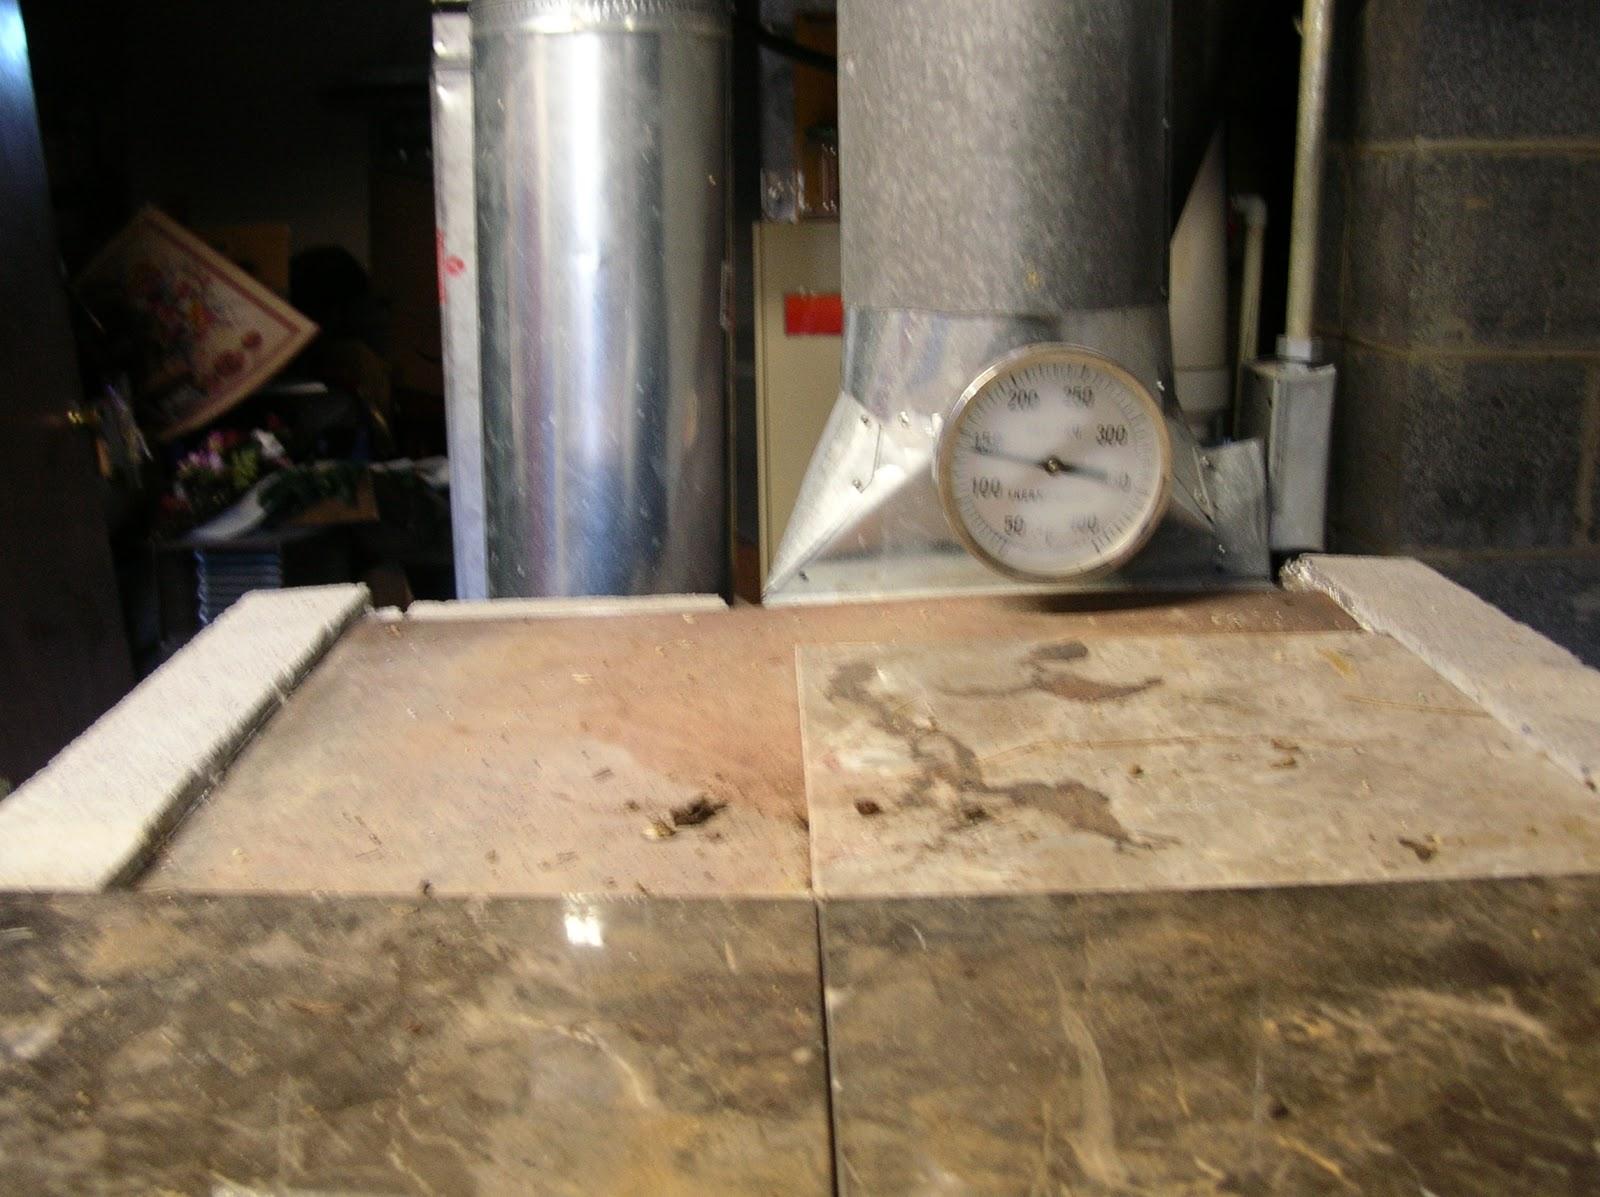 Robert's Projects: Alaska Kodiak coal stove